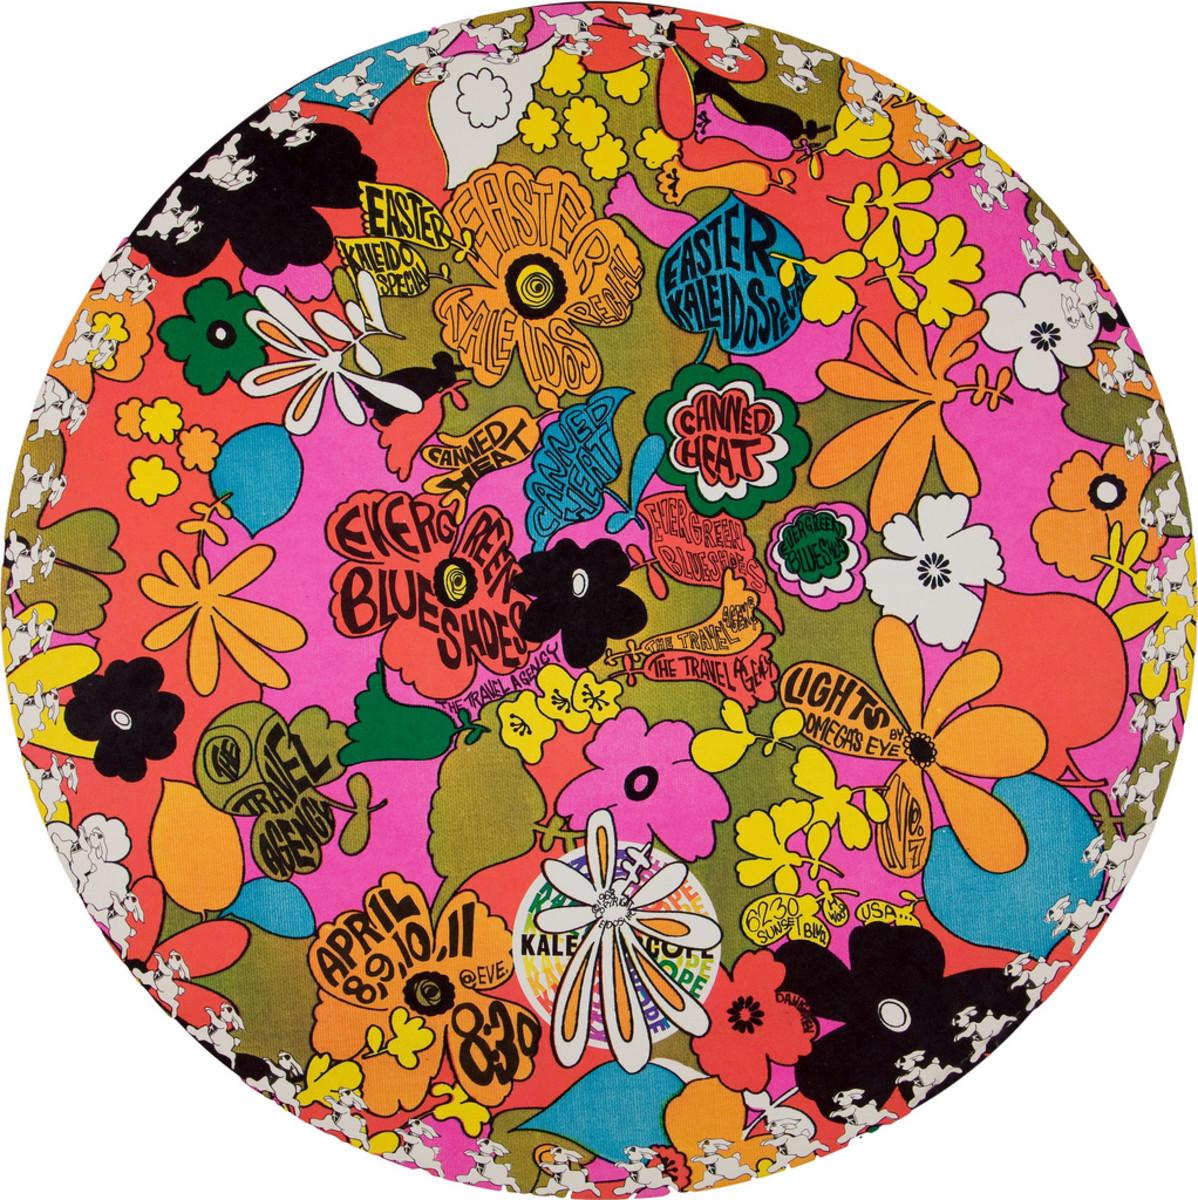 Canned Heat, Travel Agency, Evergreen Blue Shoes,  Kaleidoscope Concert Poster (1968) Poster #7 In Series, Art by Dick Dahlgren,